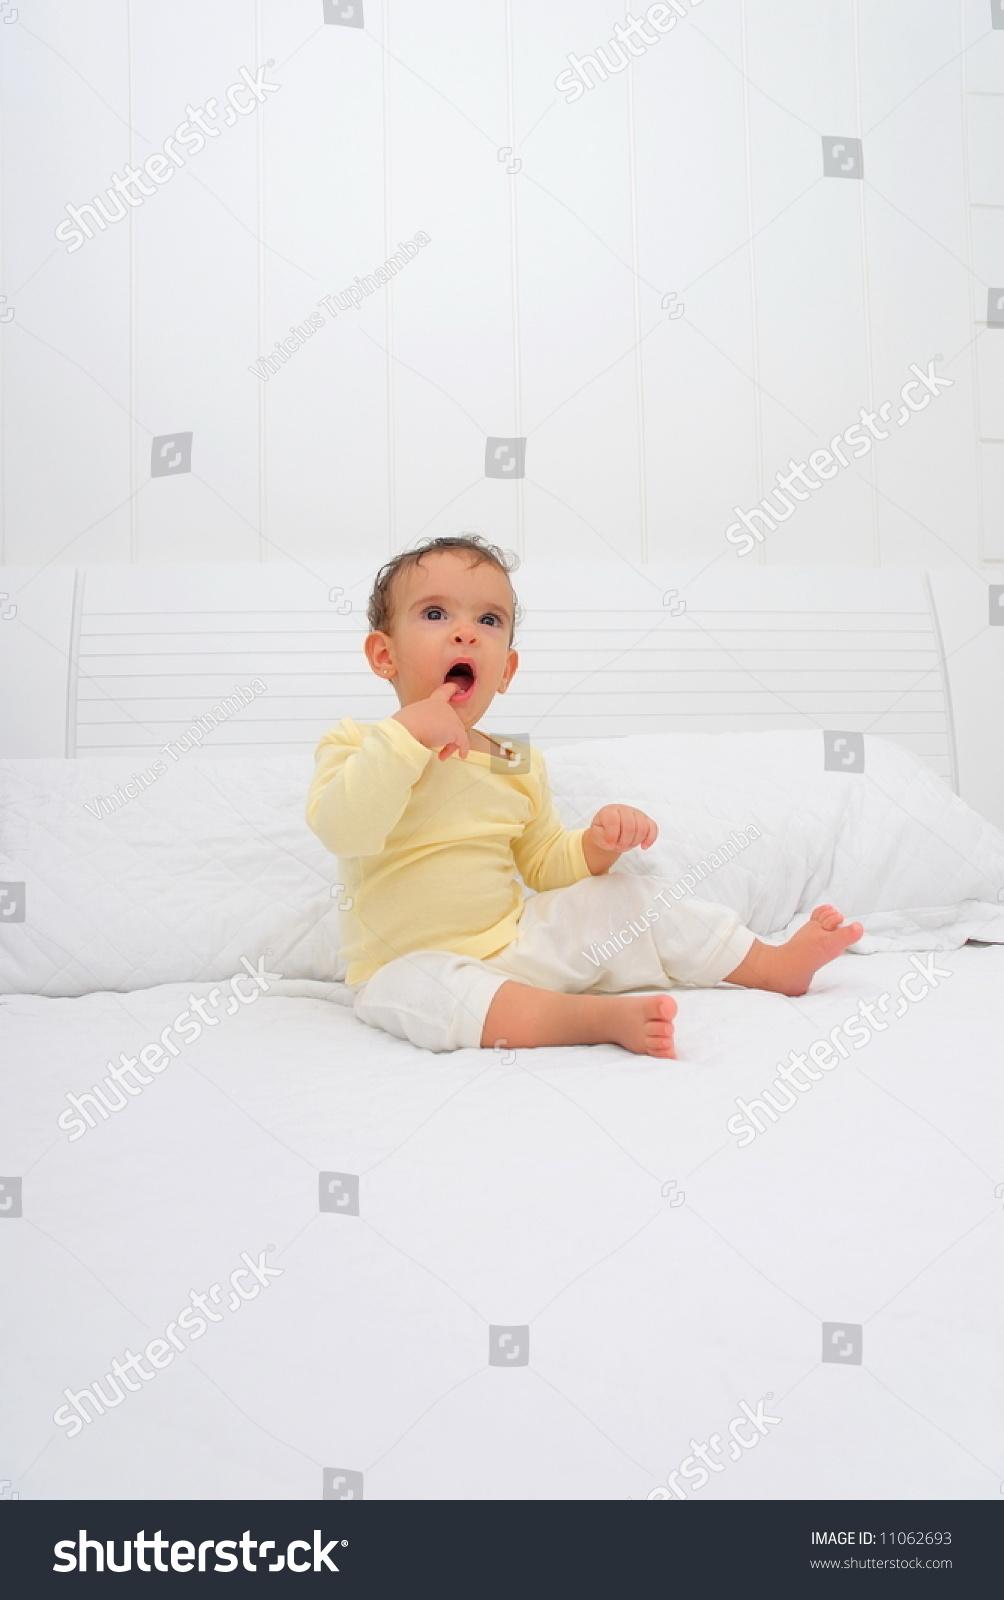 Sleepy Baby Seating On Bed Stock Photo 11062693 - Shutterstock